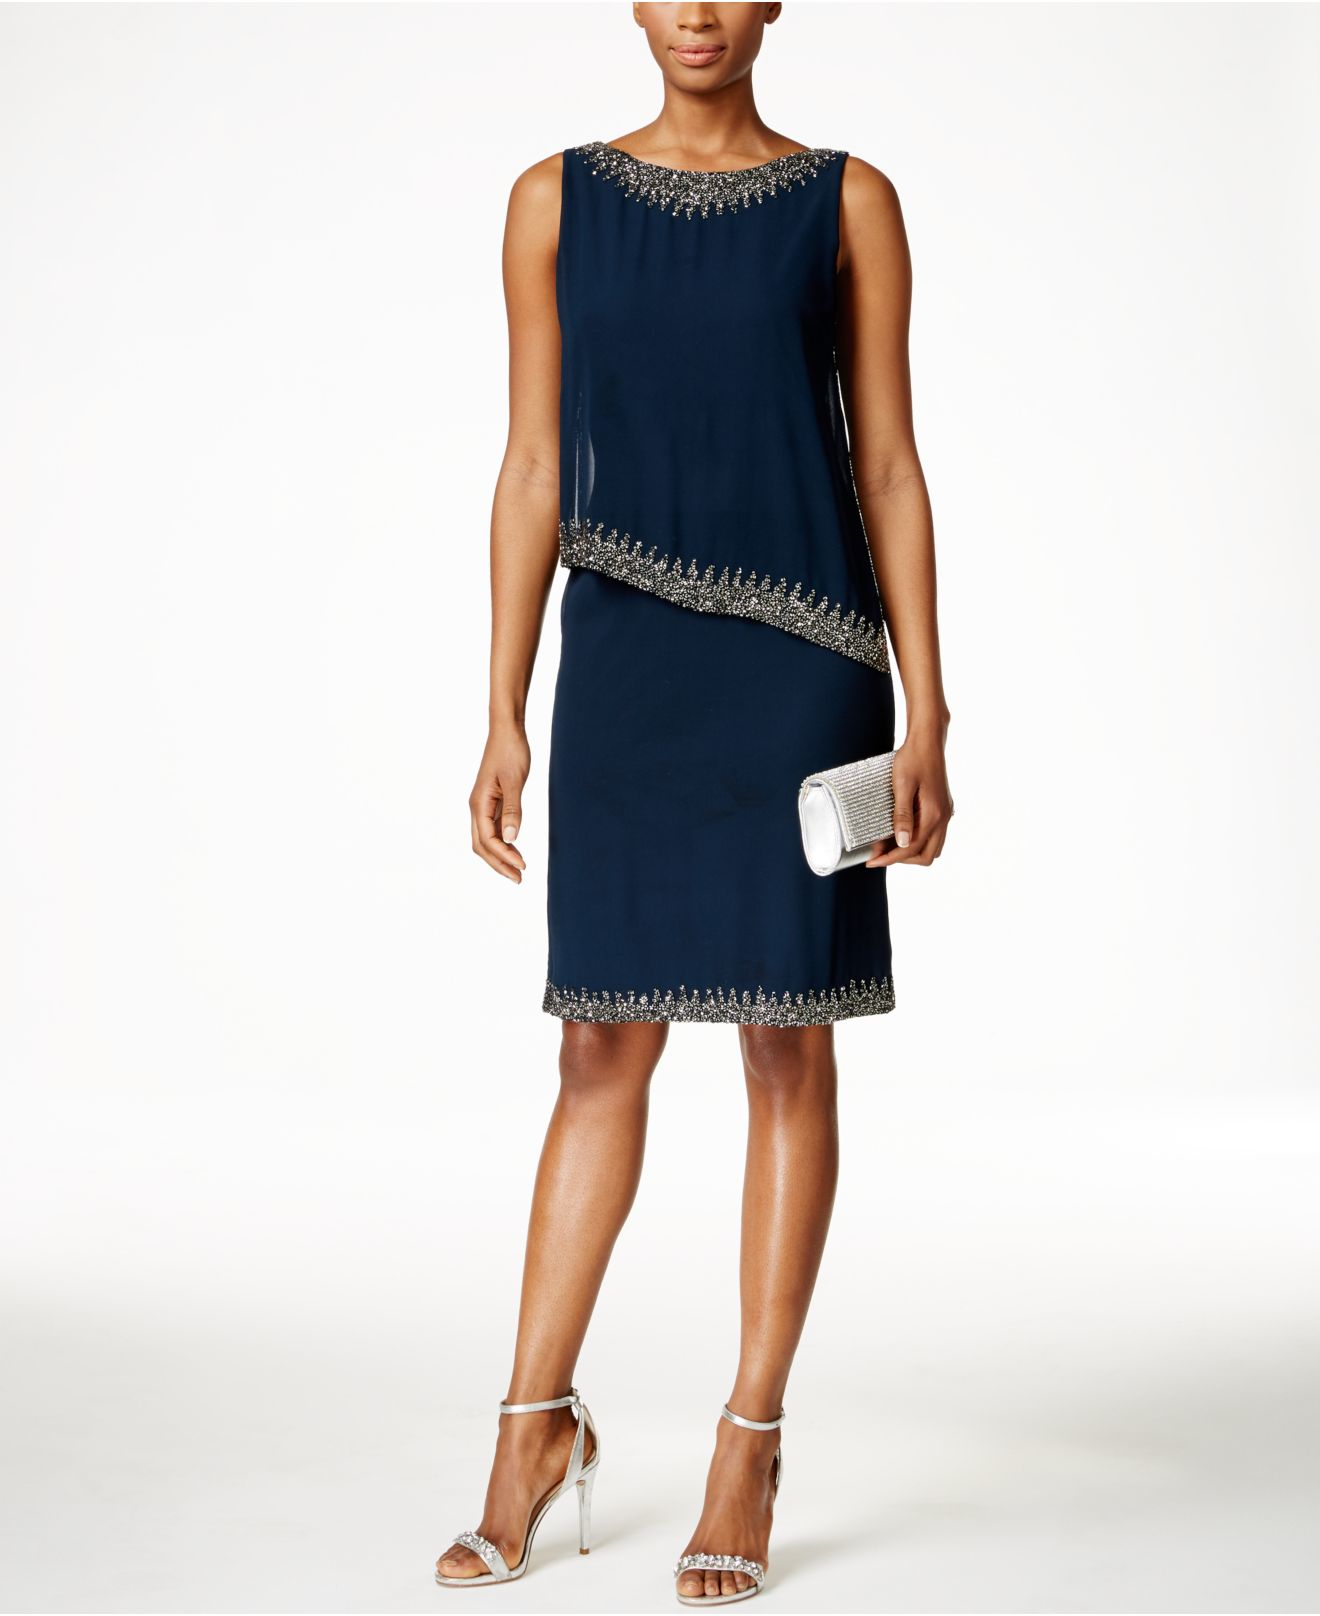 Macys Navy Blue Dresses: J Kara Beaded Capelet Dress In Blue